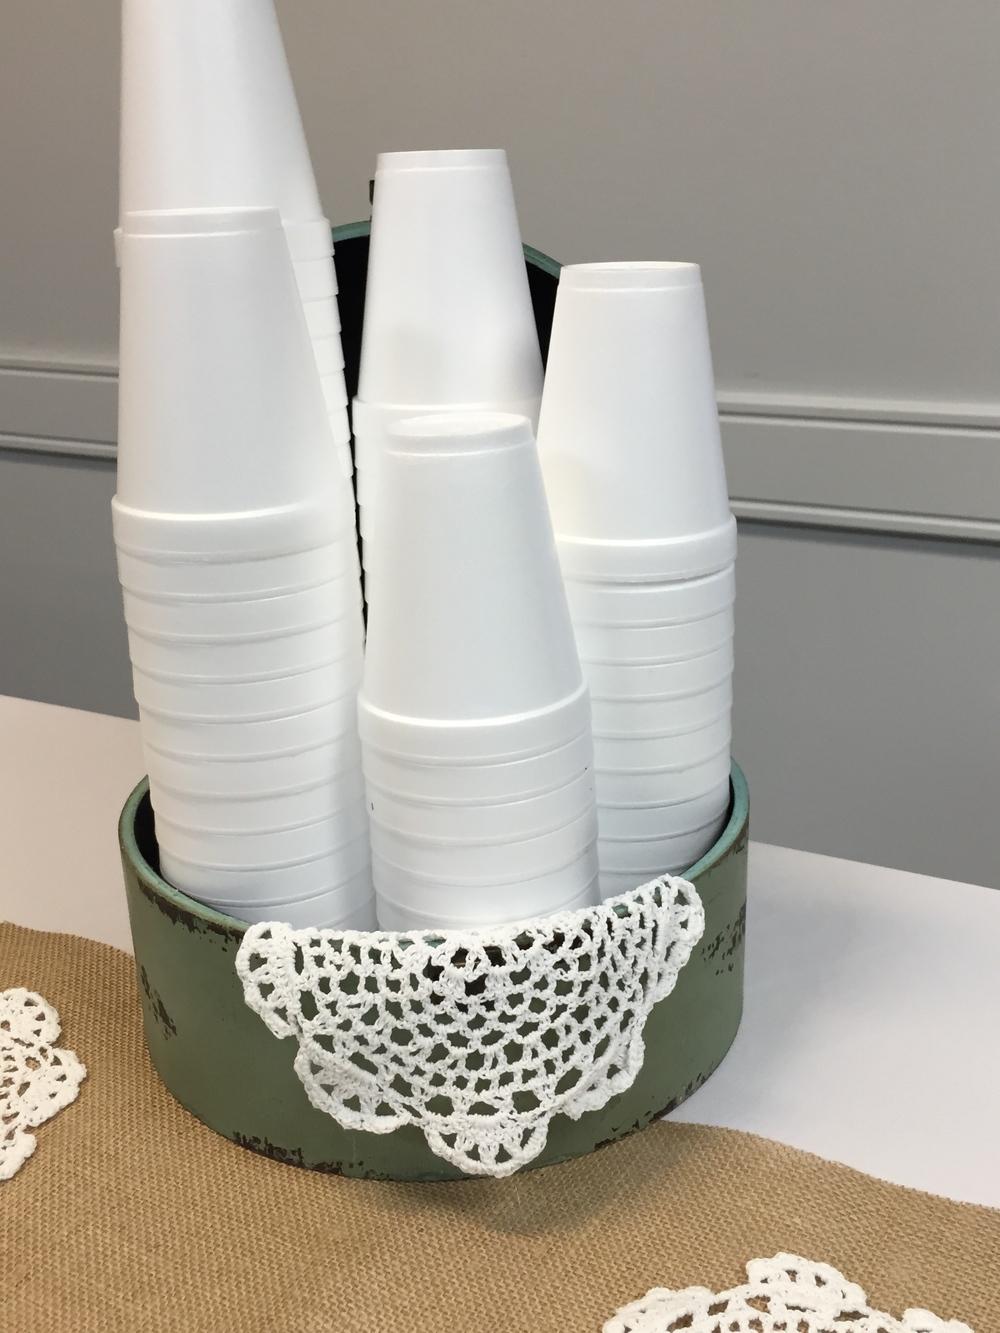 Dressing up Styrofoam cups 101.